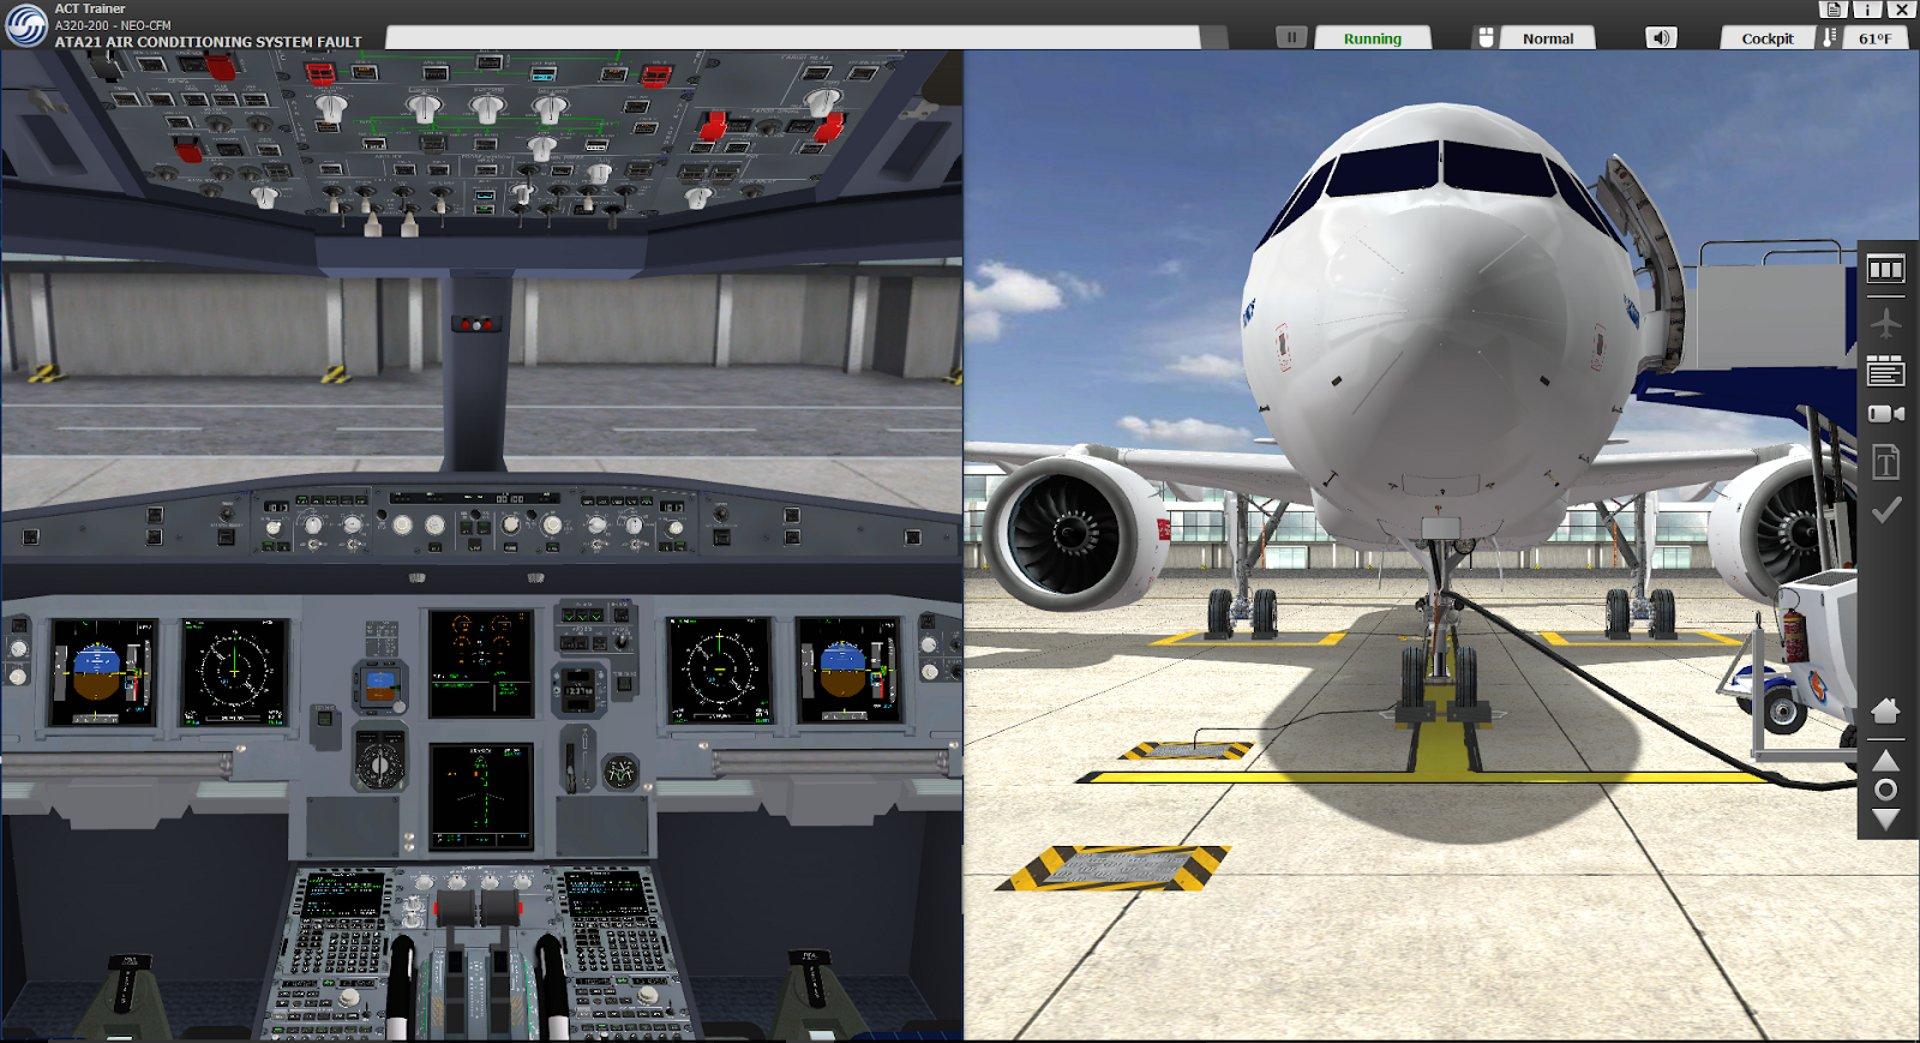 Airbus' Maintenance Integrated Training Solution